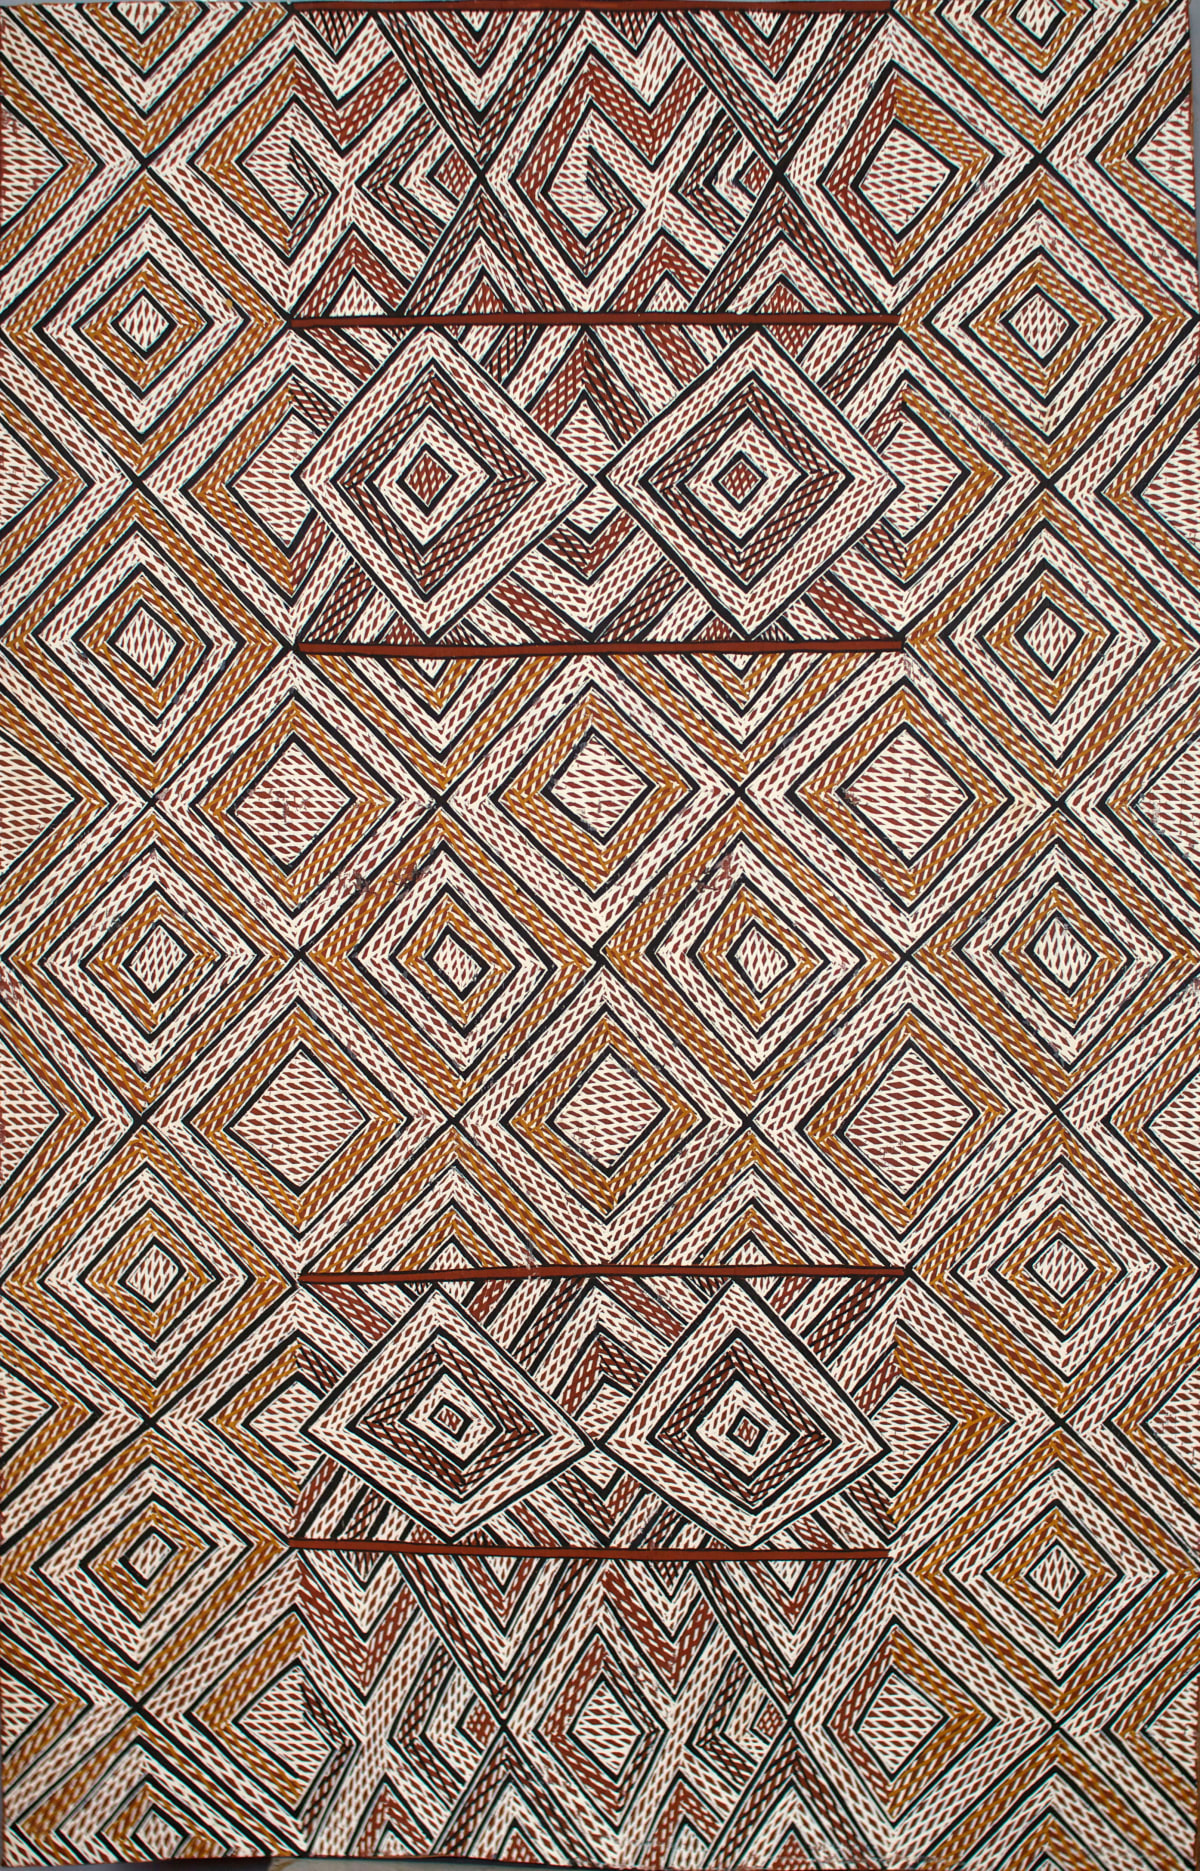 Garawan Wanambi Unititled (Luck) natural earth pigment on bark 89 x 57 cm